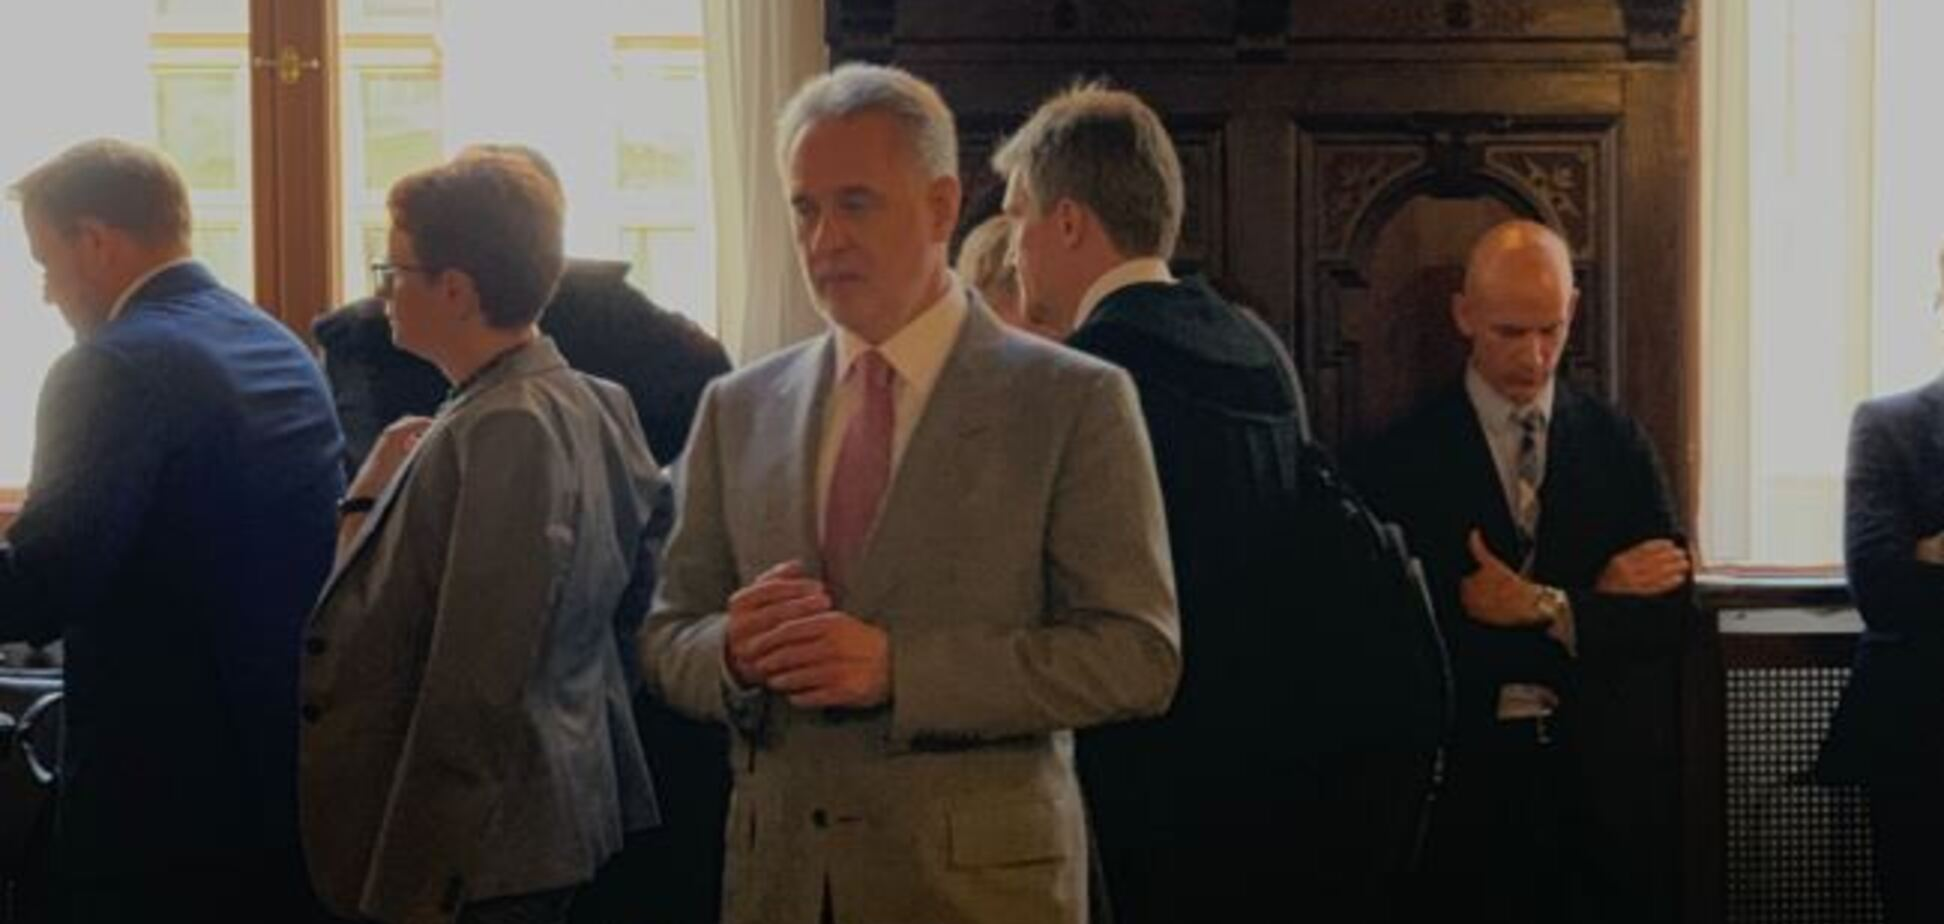 В Австрии начался громкий суд по Фирташу: на заседание приехал Левочкин